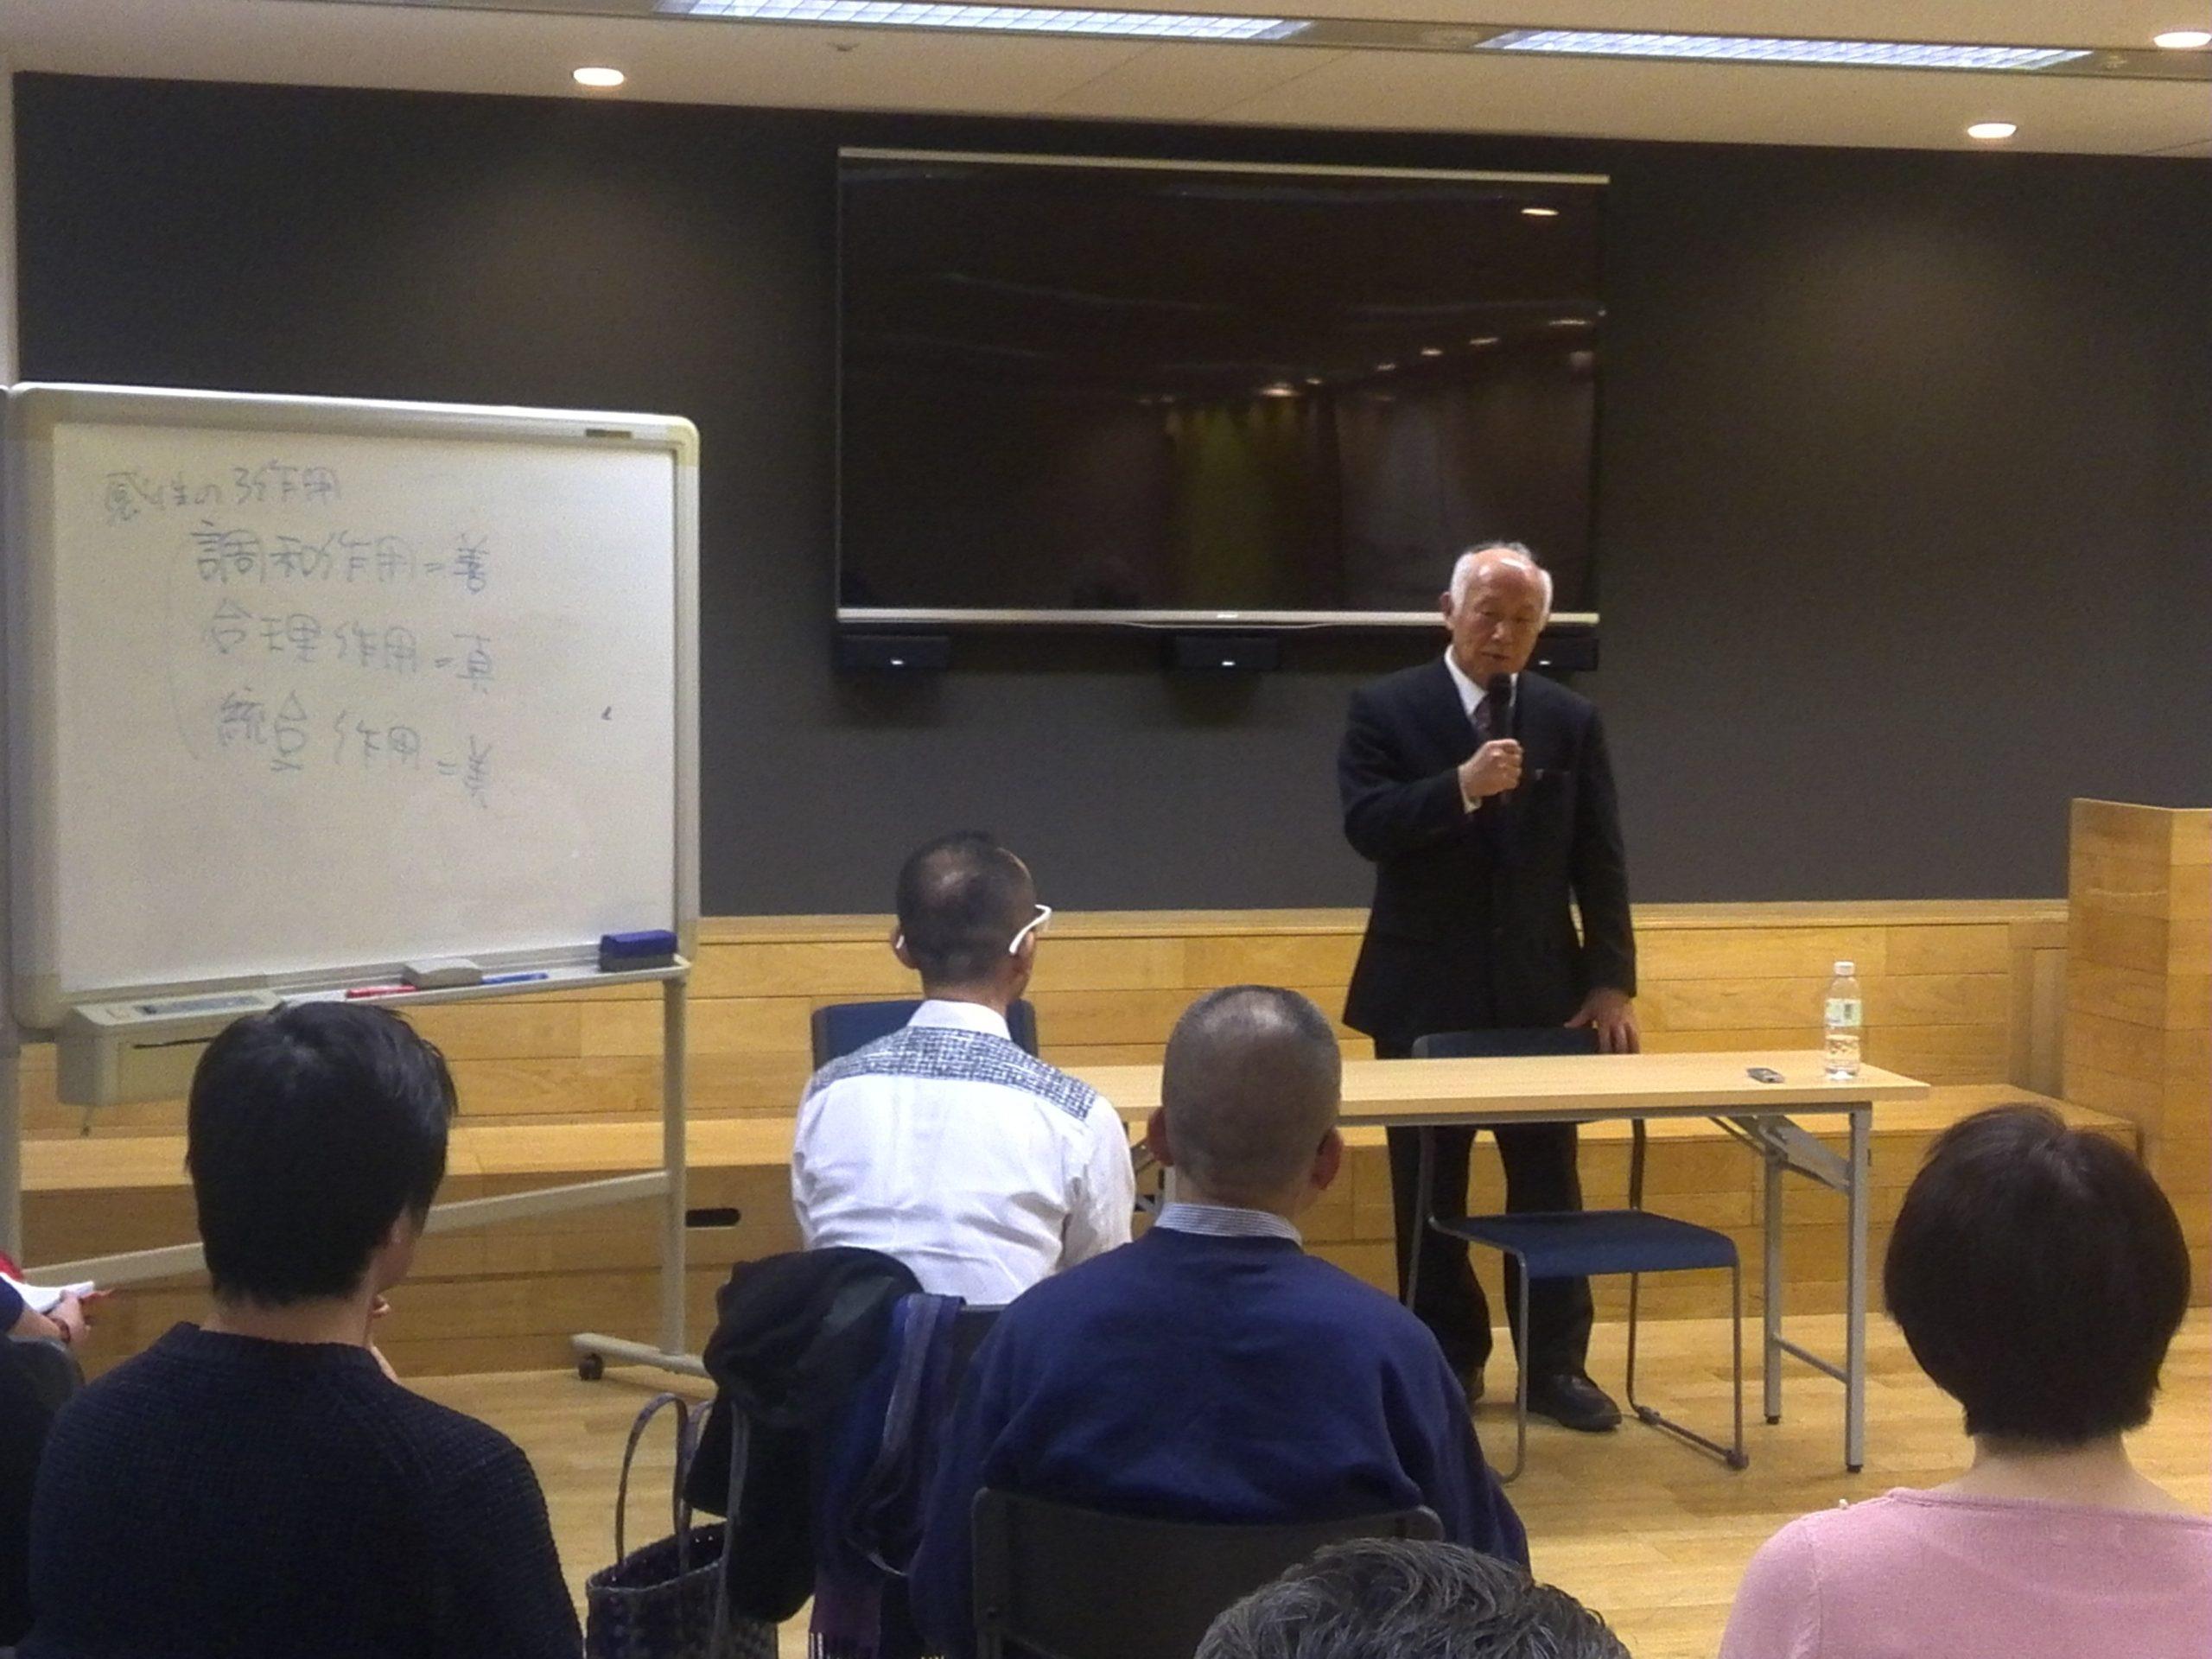 IMG 20110101 124317 scaled - 2020年2月1日東京思風塾開催